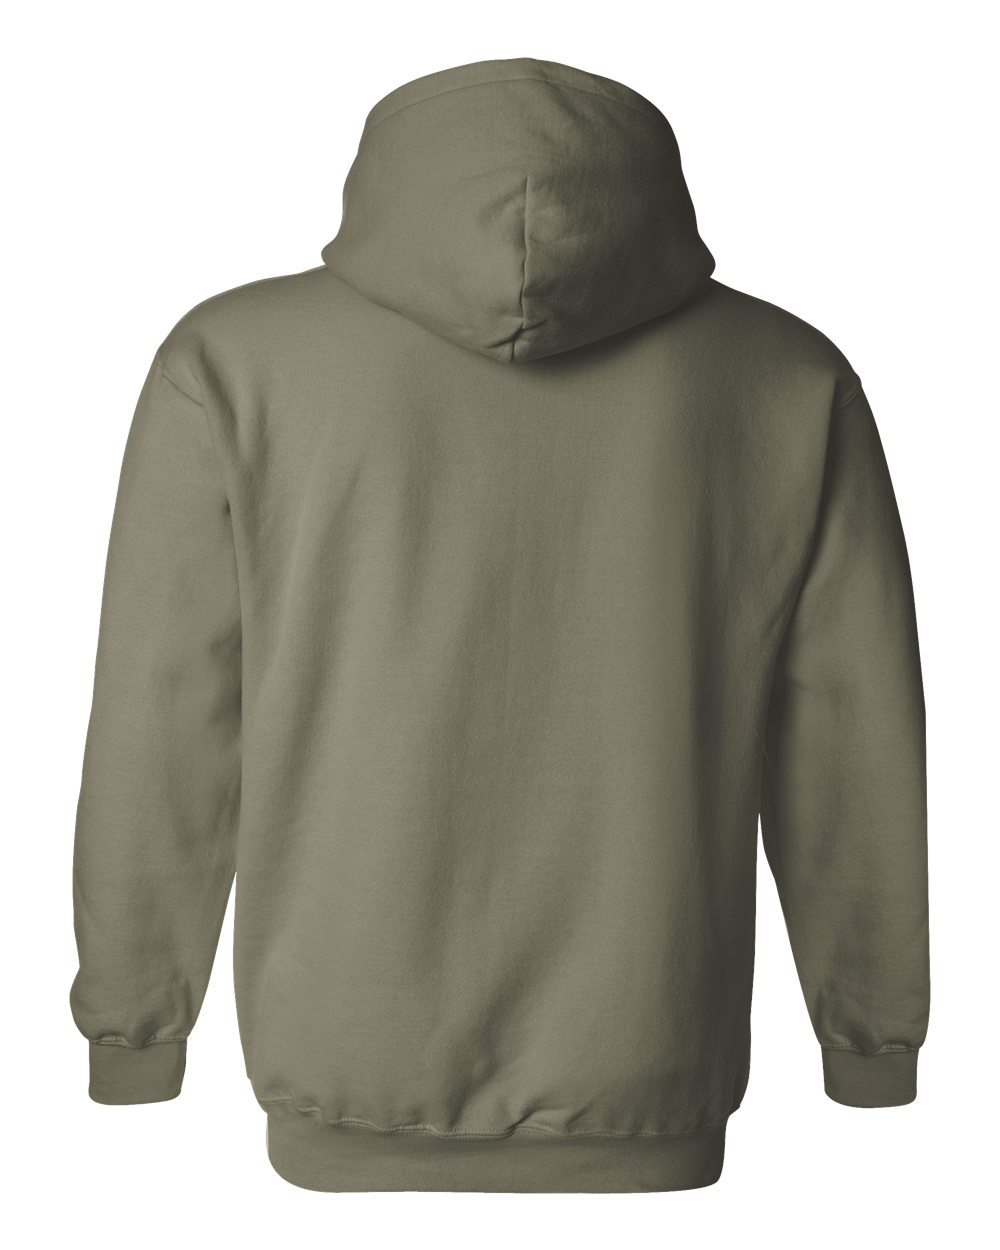 Gildan-Mens-Blank-Hoodie-Heavy-Blend-Hooded-Sweatshirt-Solid-18500-up-to-5XL thumbnail 60